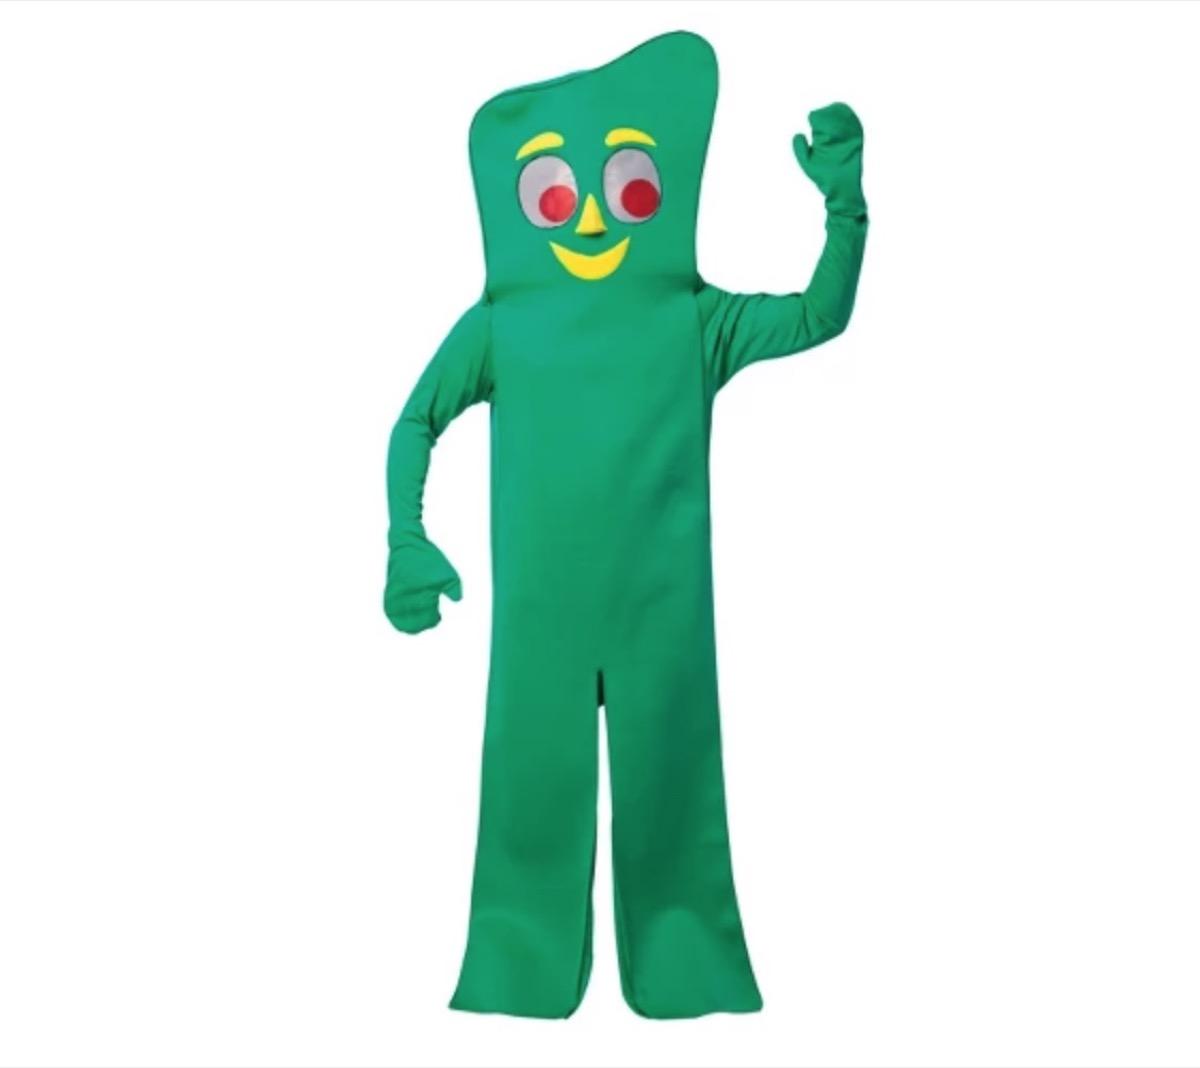 Gumby costume, target halloween costumes